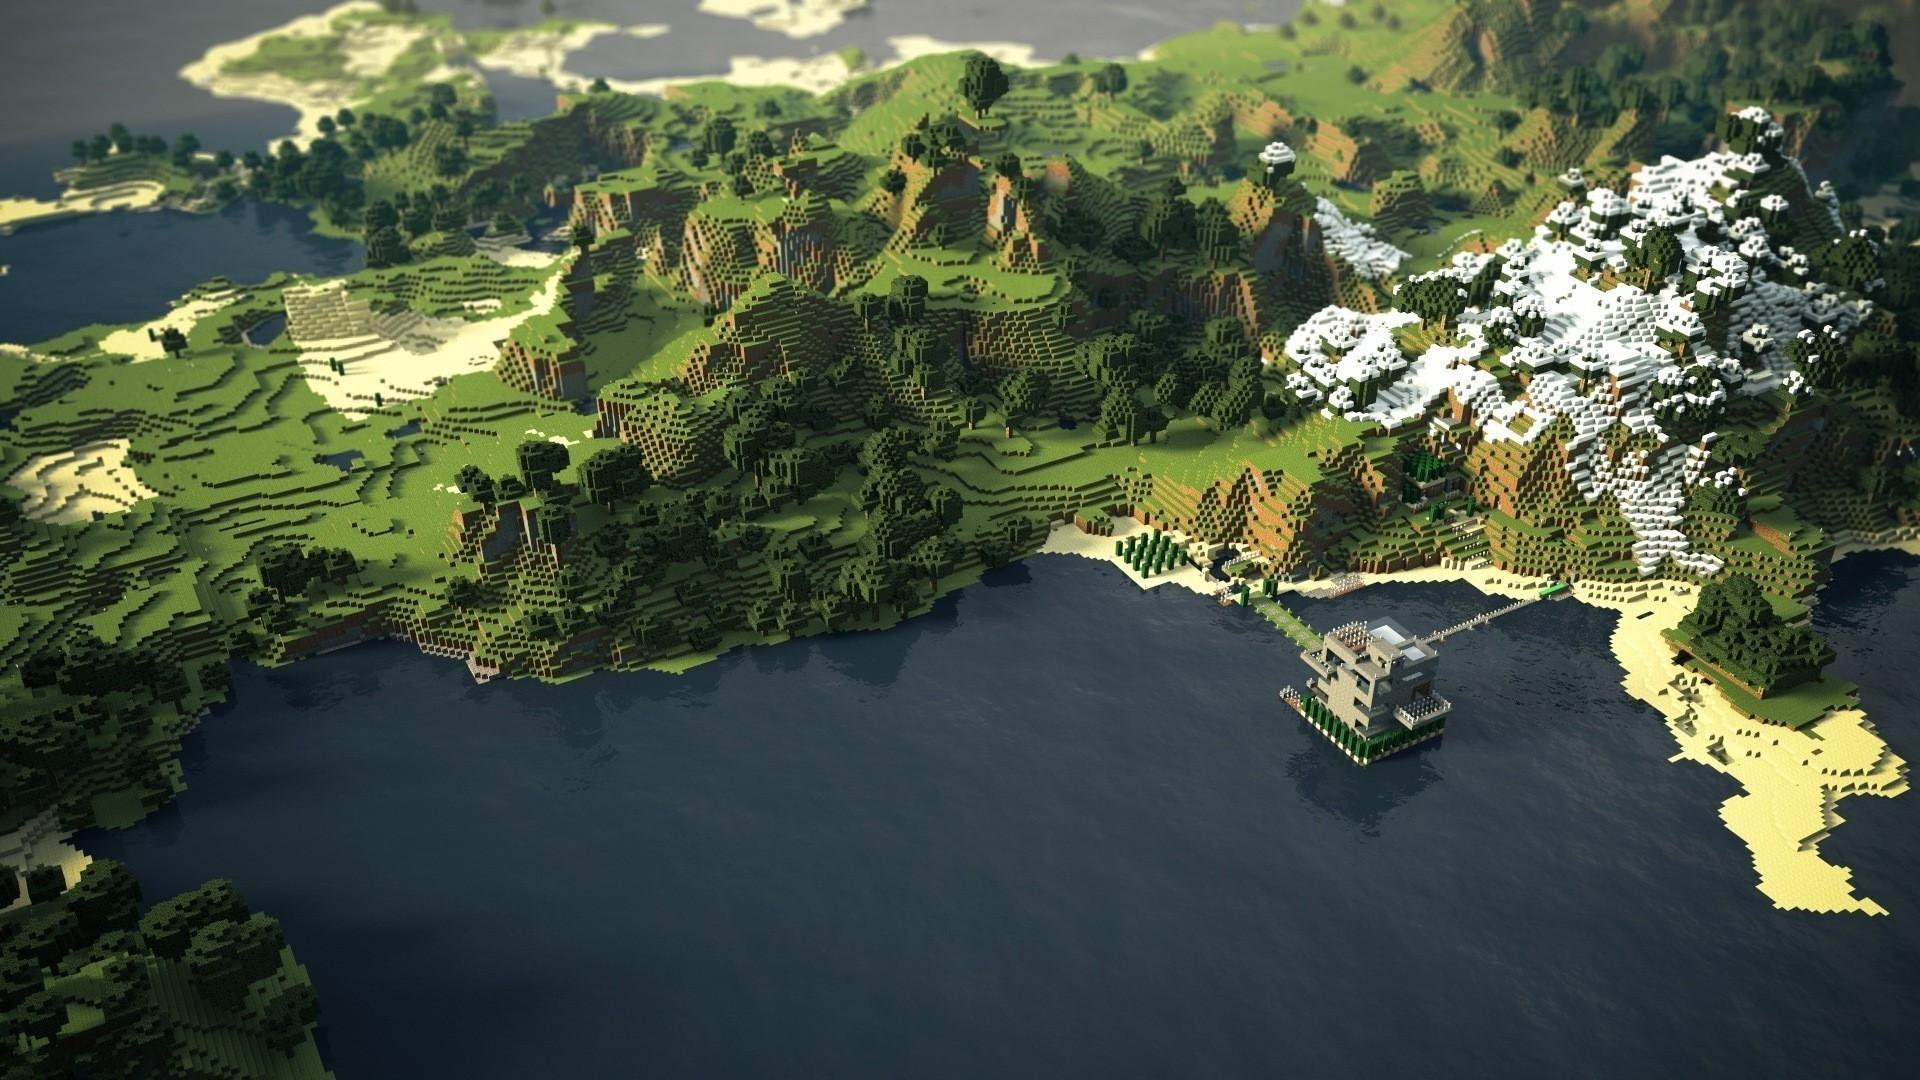 Minecraft Wallpaper Romantic Desktop HD Resolution 226 Backgrounds